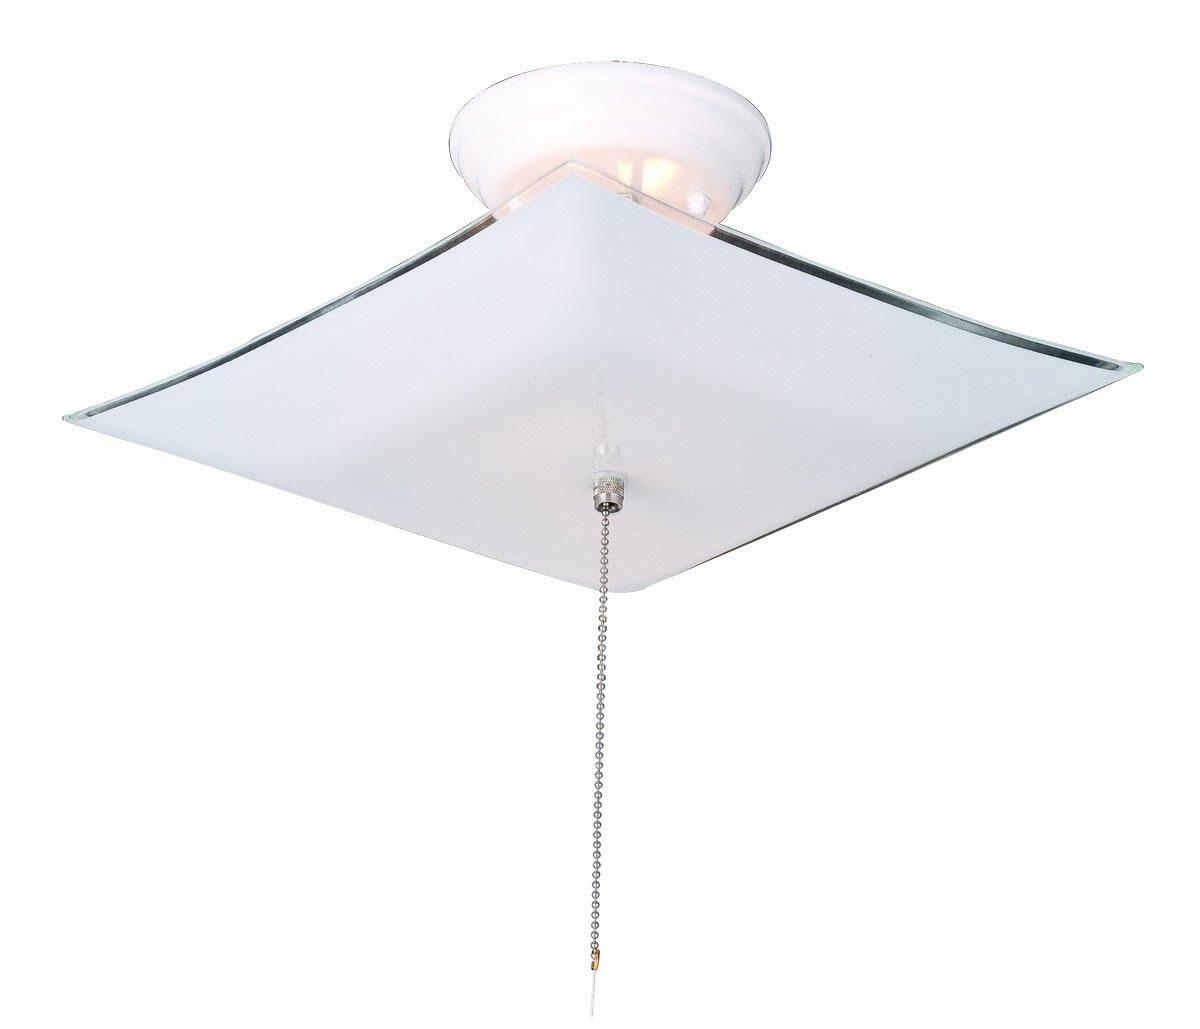 5000k Led Shop Light Linkable 4ft Daylight 42w Led Ceiling